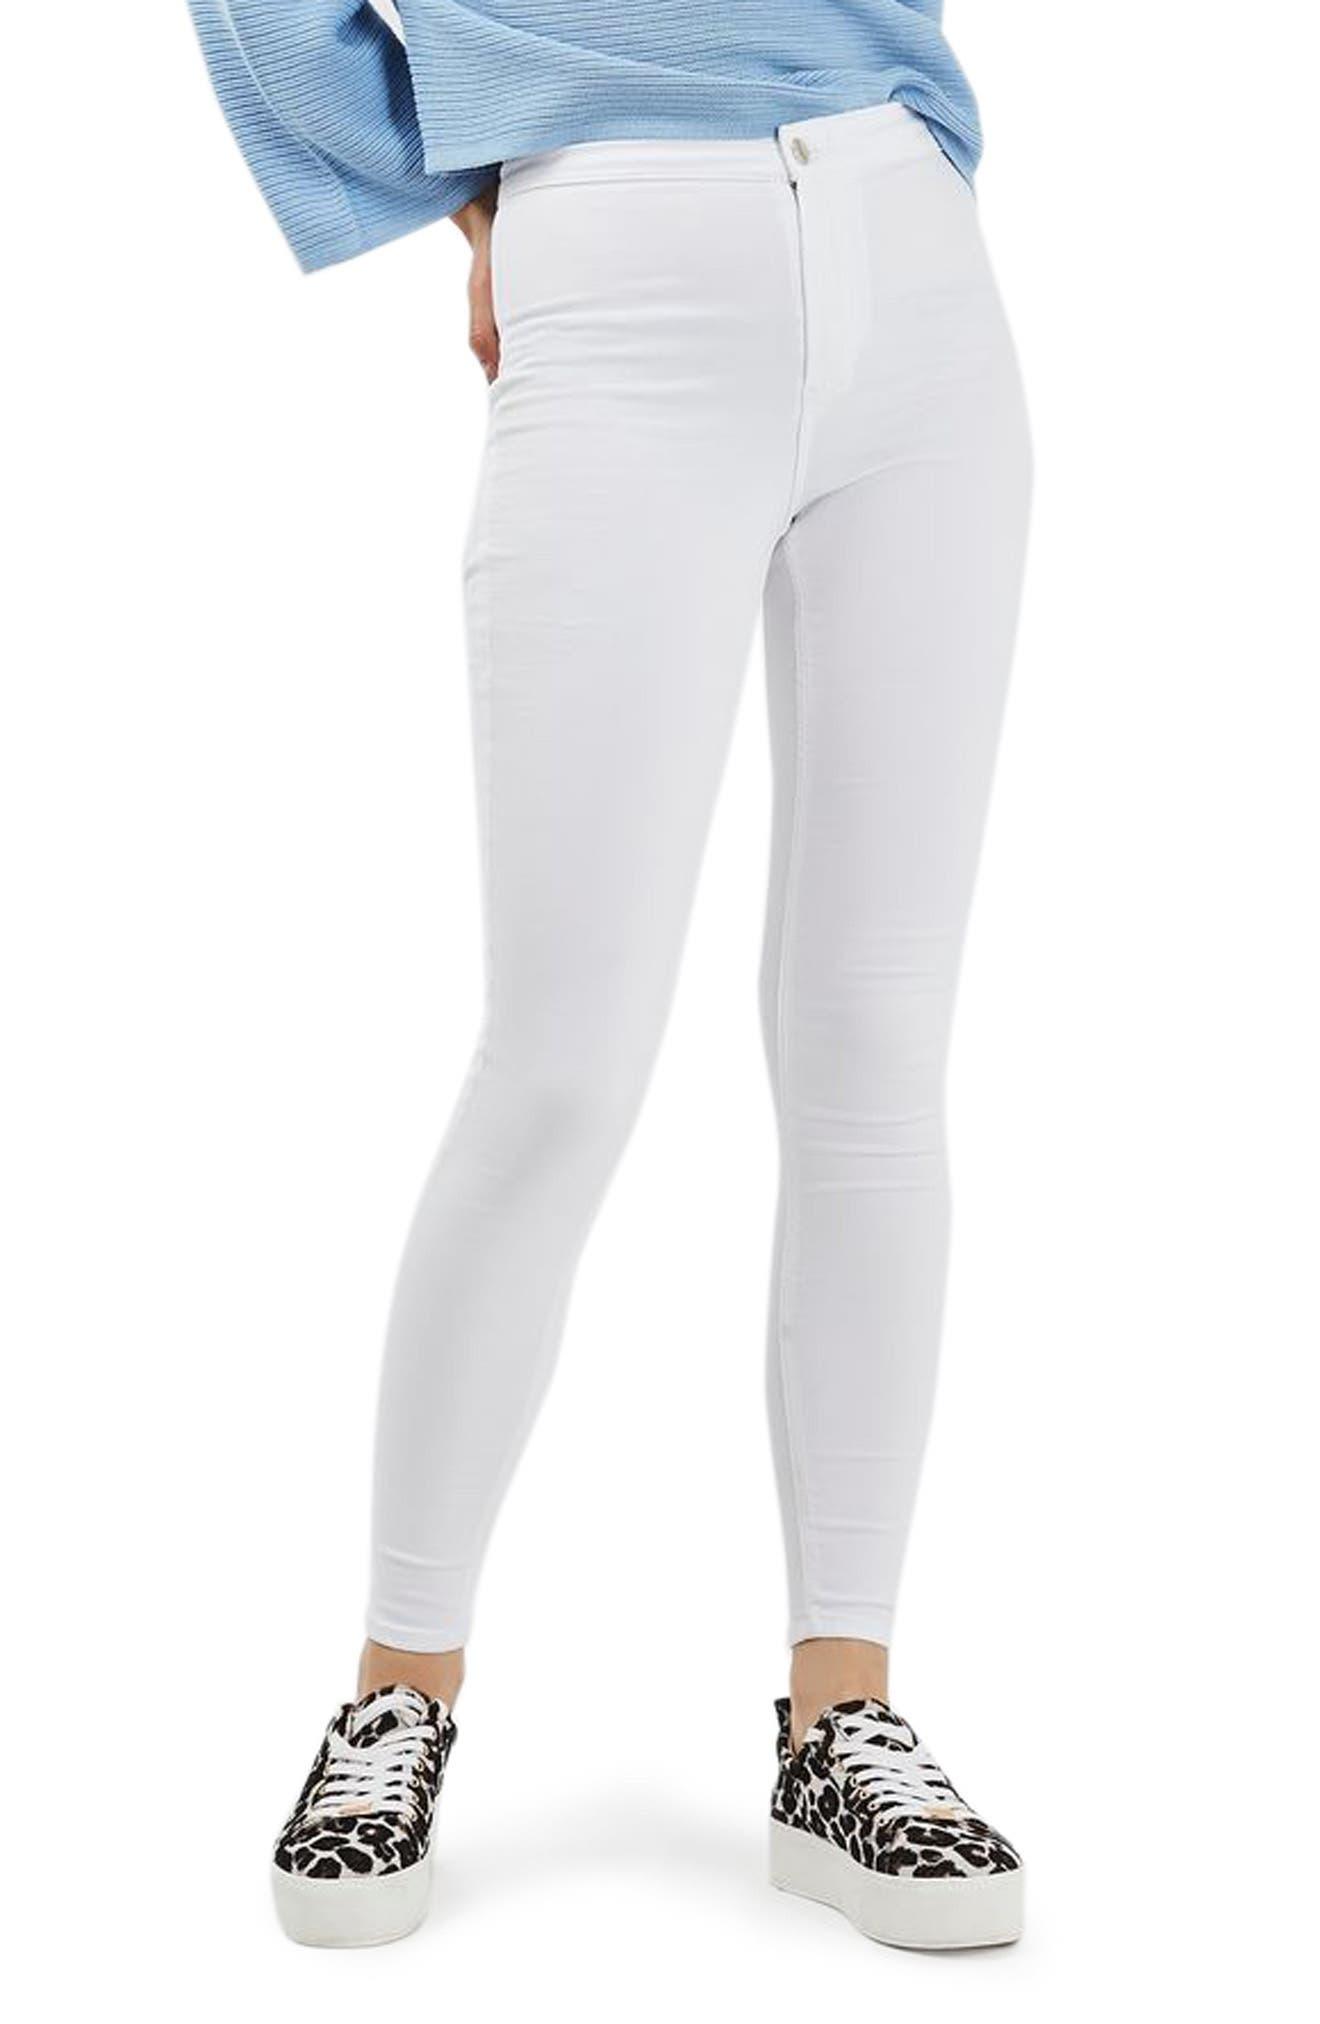 Topshop Joni Skinny Jeans (Regular & Petite)